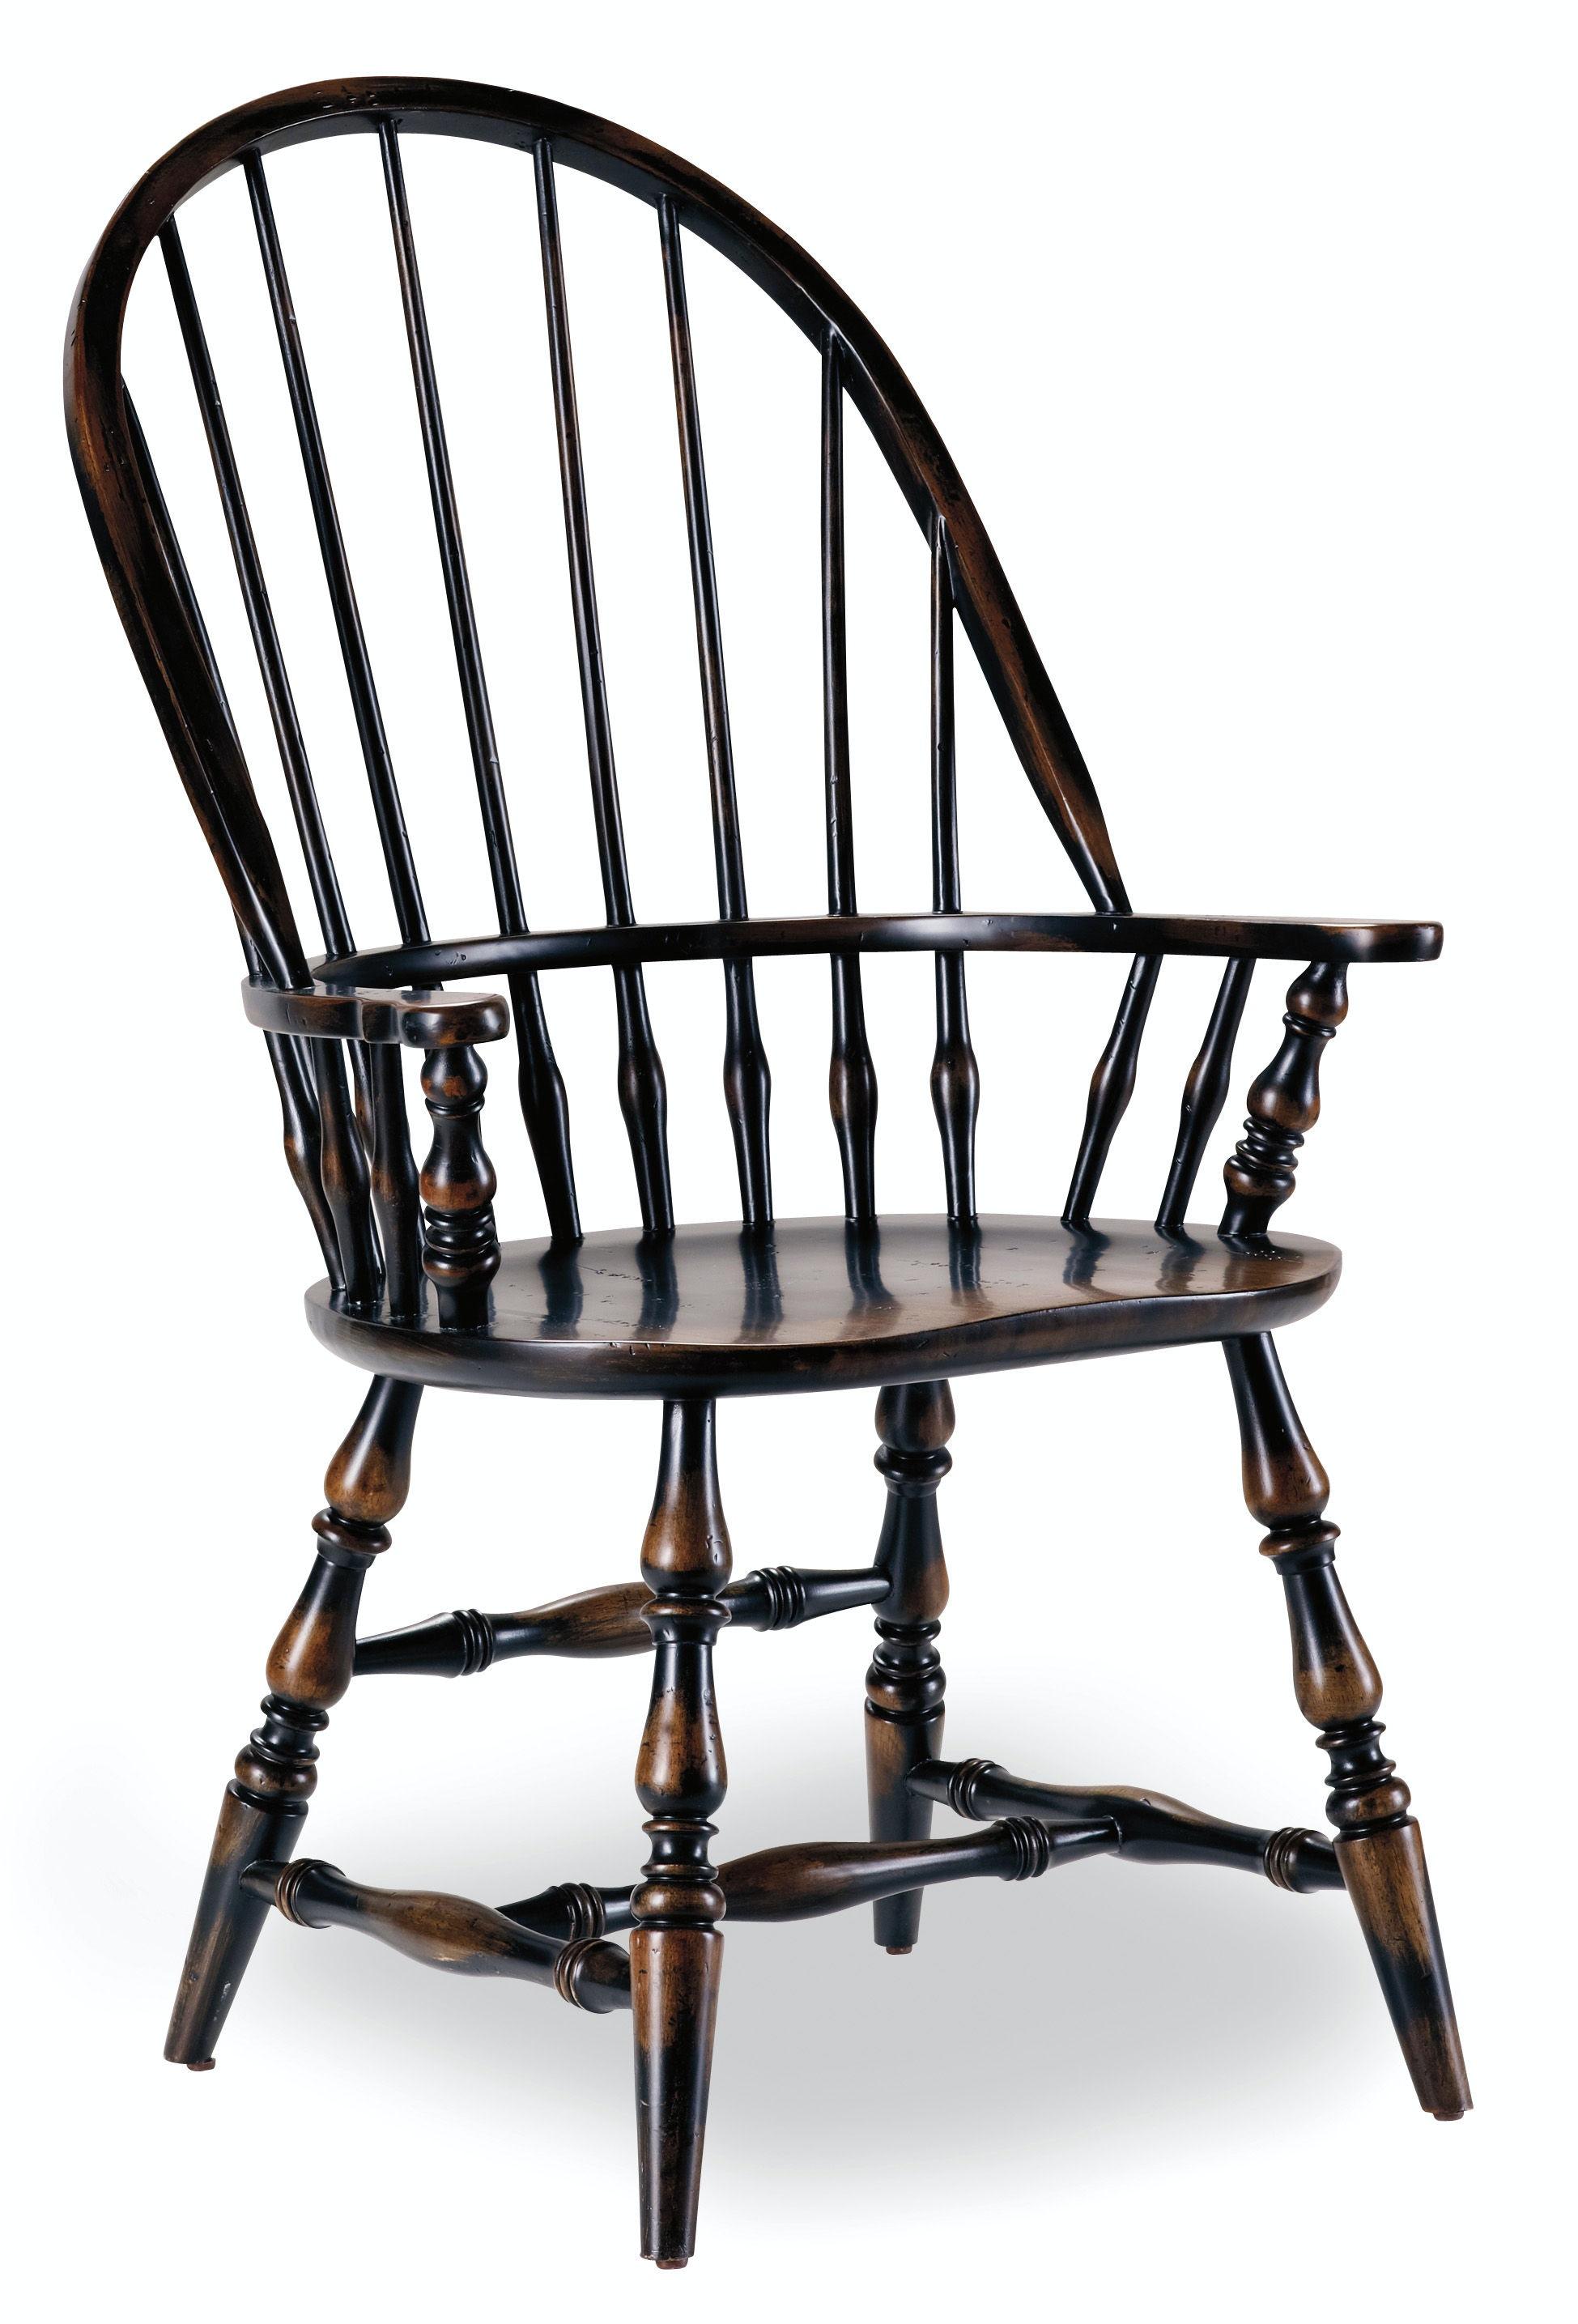 Good Hooker Furniture Sanctuary Windsor Arm Chair Ebony 3005 75320